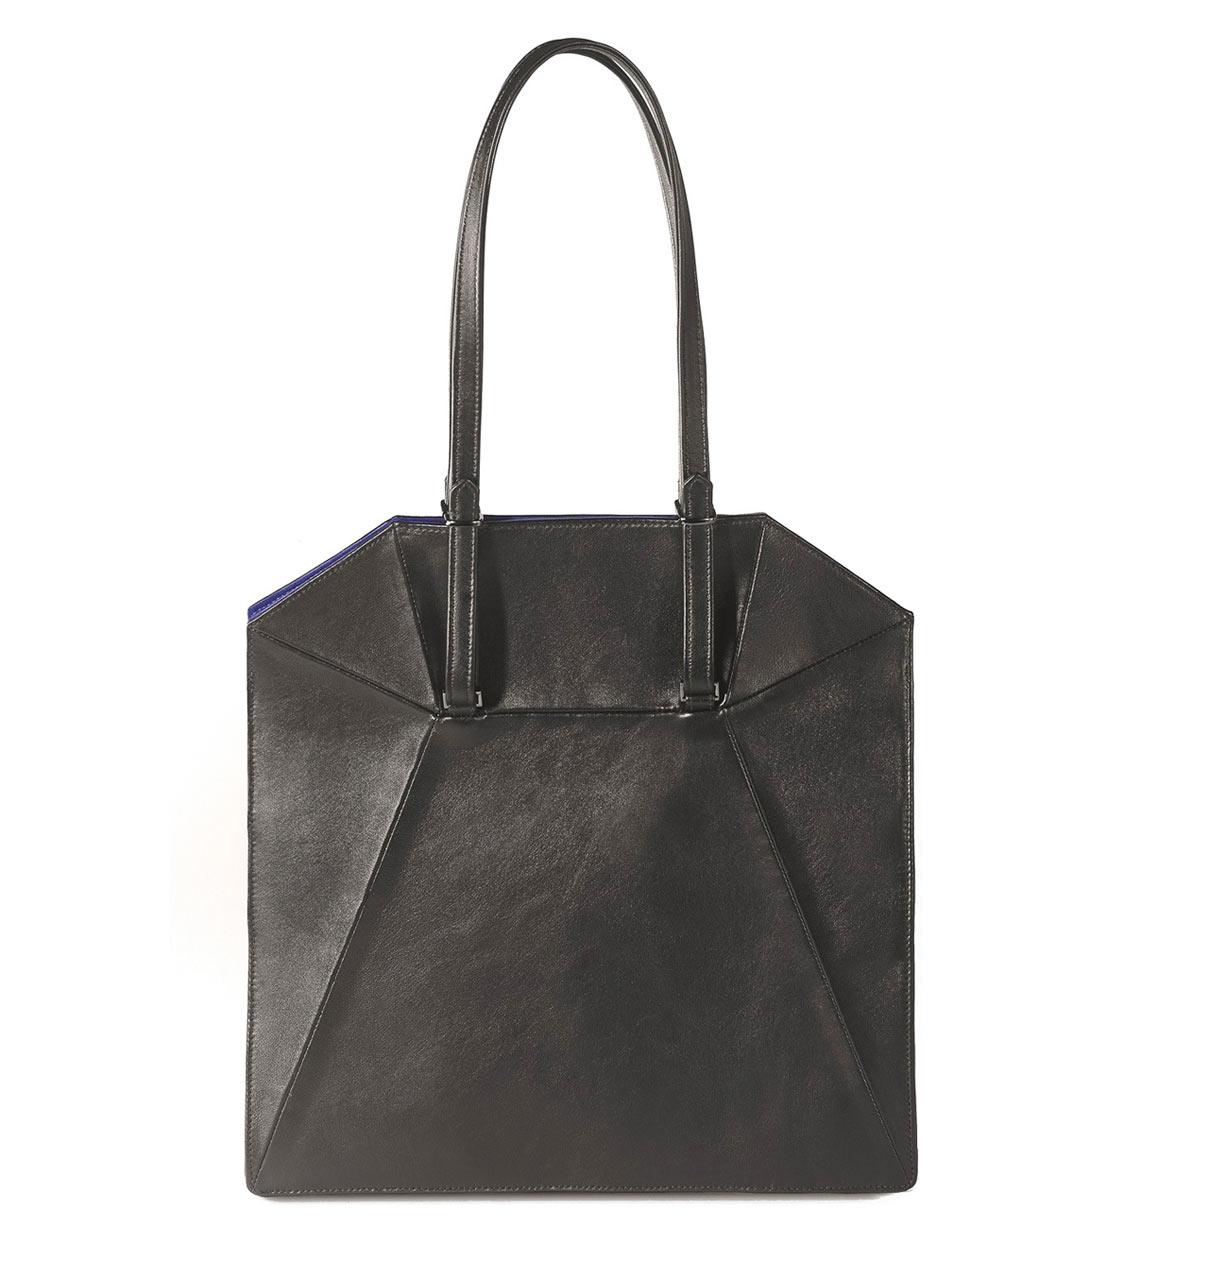 Imago-A-Prism-Bags-11-Tote-Black